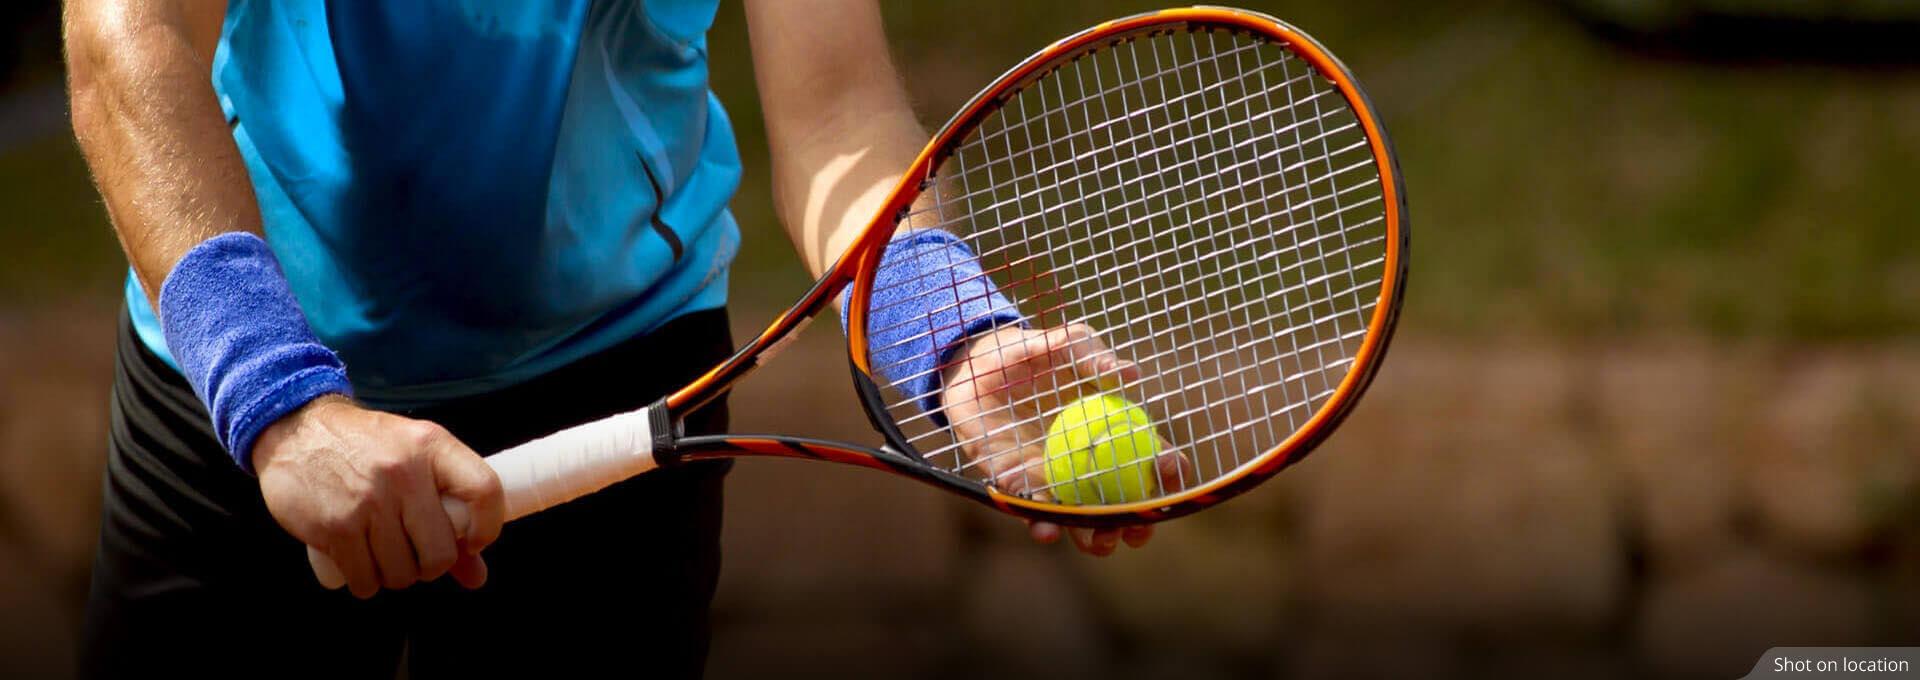 Lawn Tennis in Evita  by House of Hirandani in Bannerghatta, Bengaluru